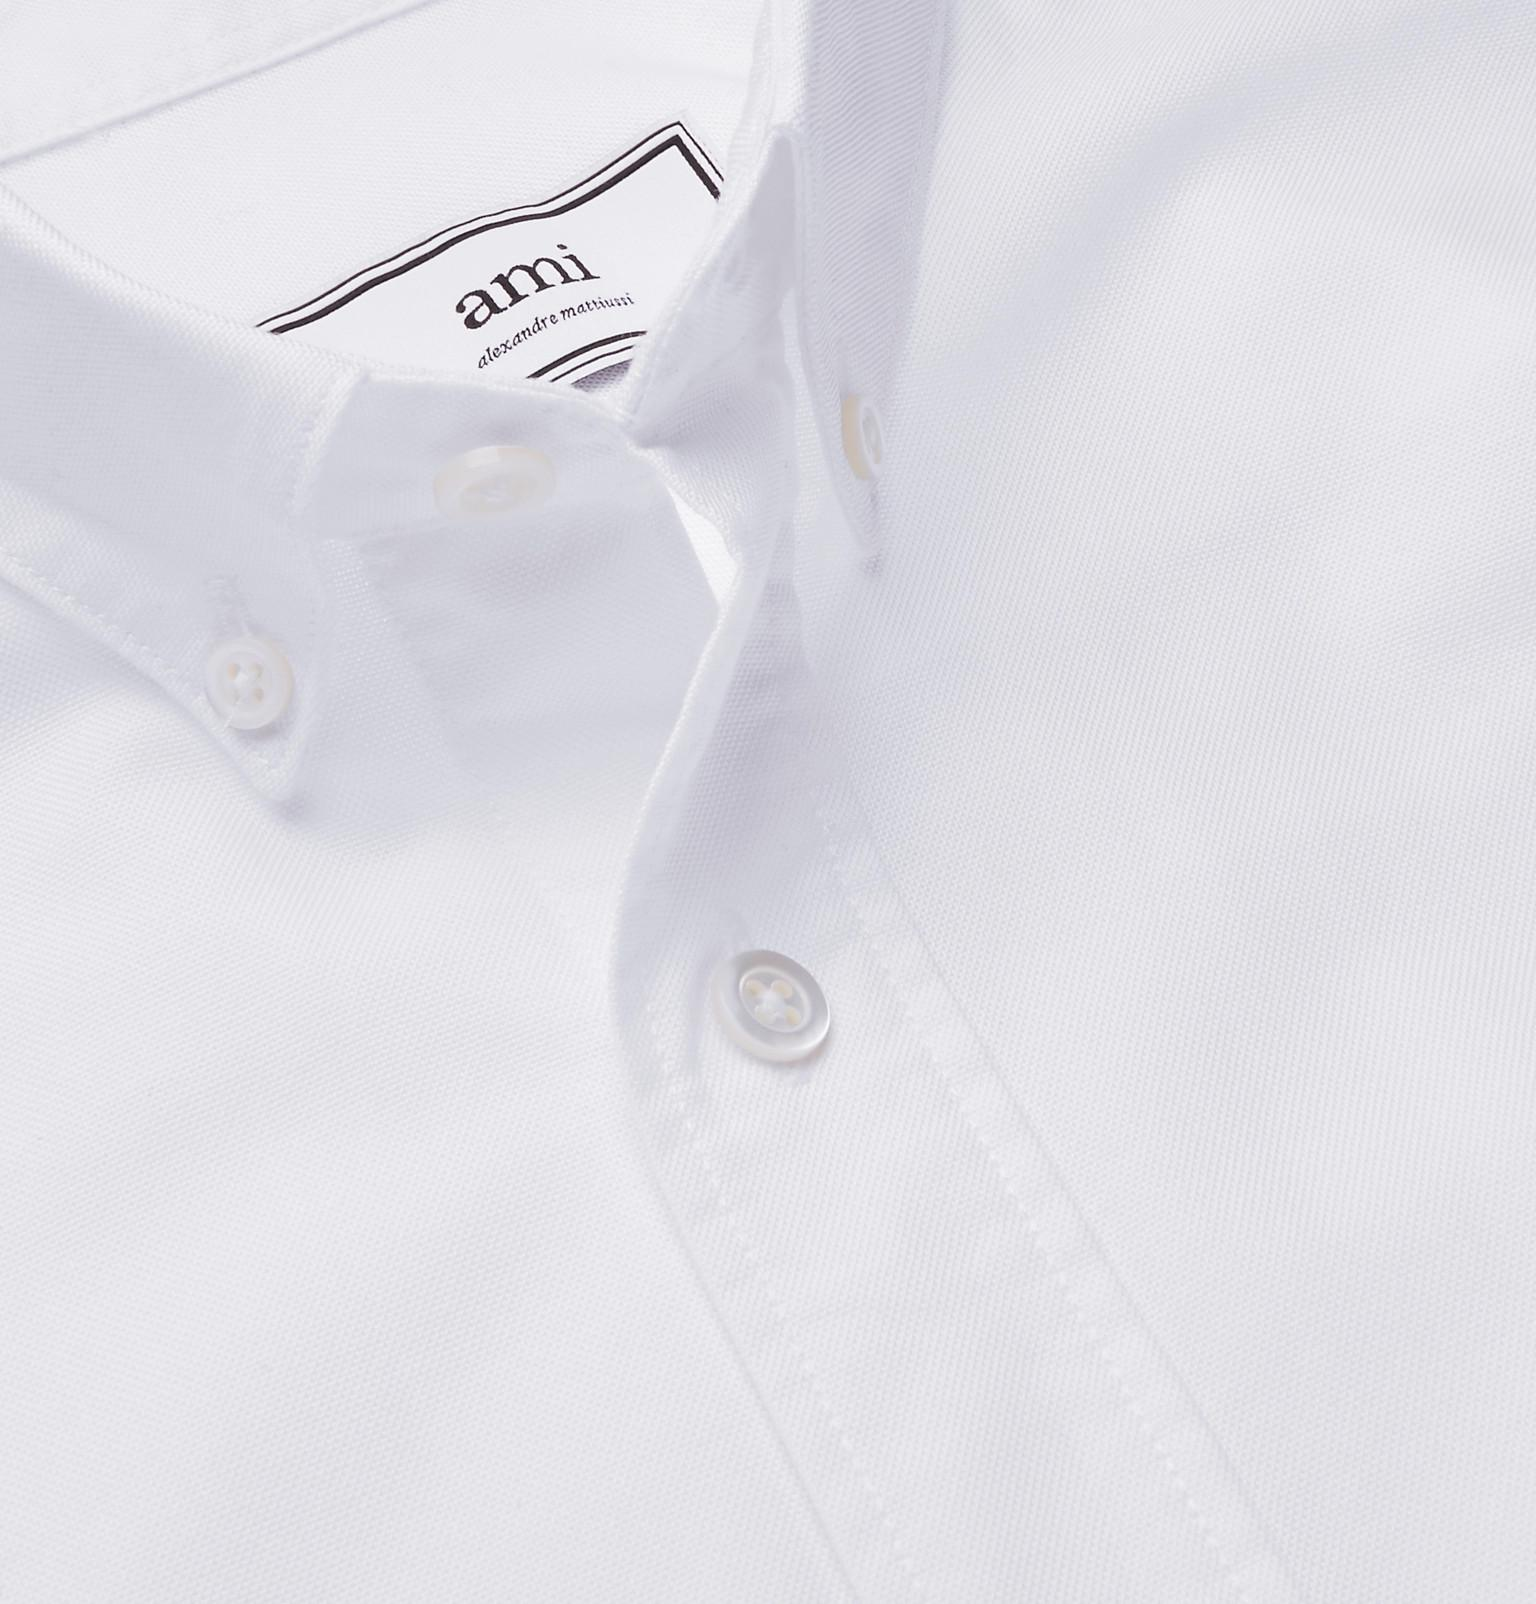 44ac0abec9c Lyst - AMI Appliquéd Button-down Collar Cotton Oxford Shirt in White ...